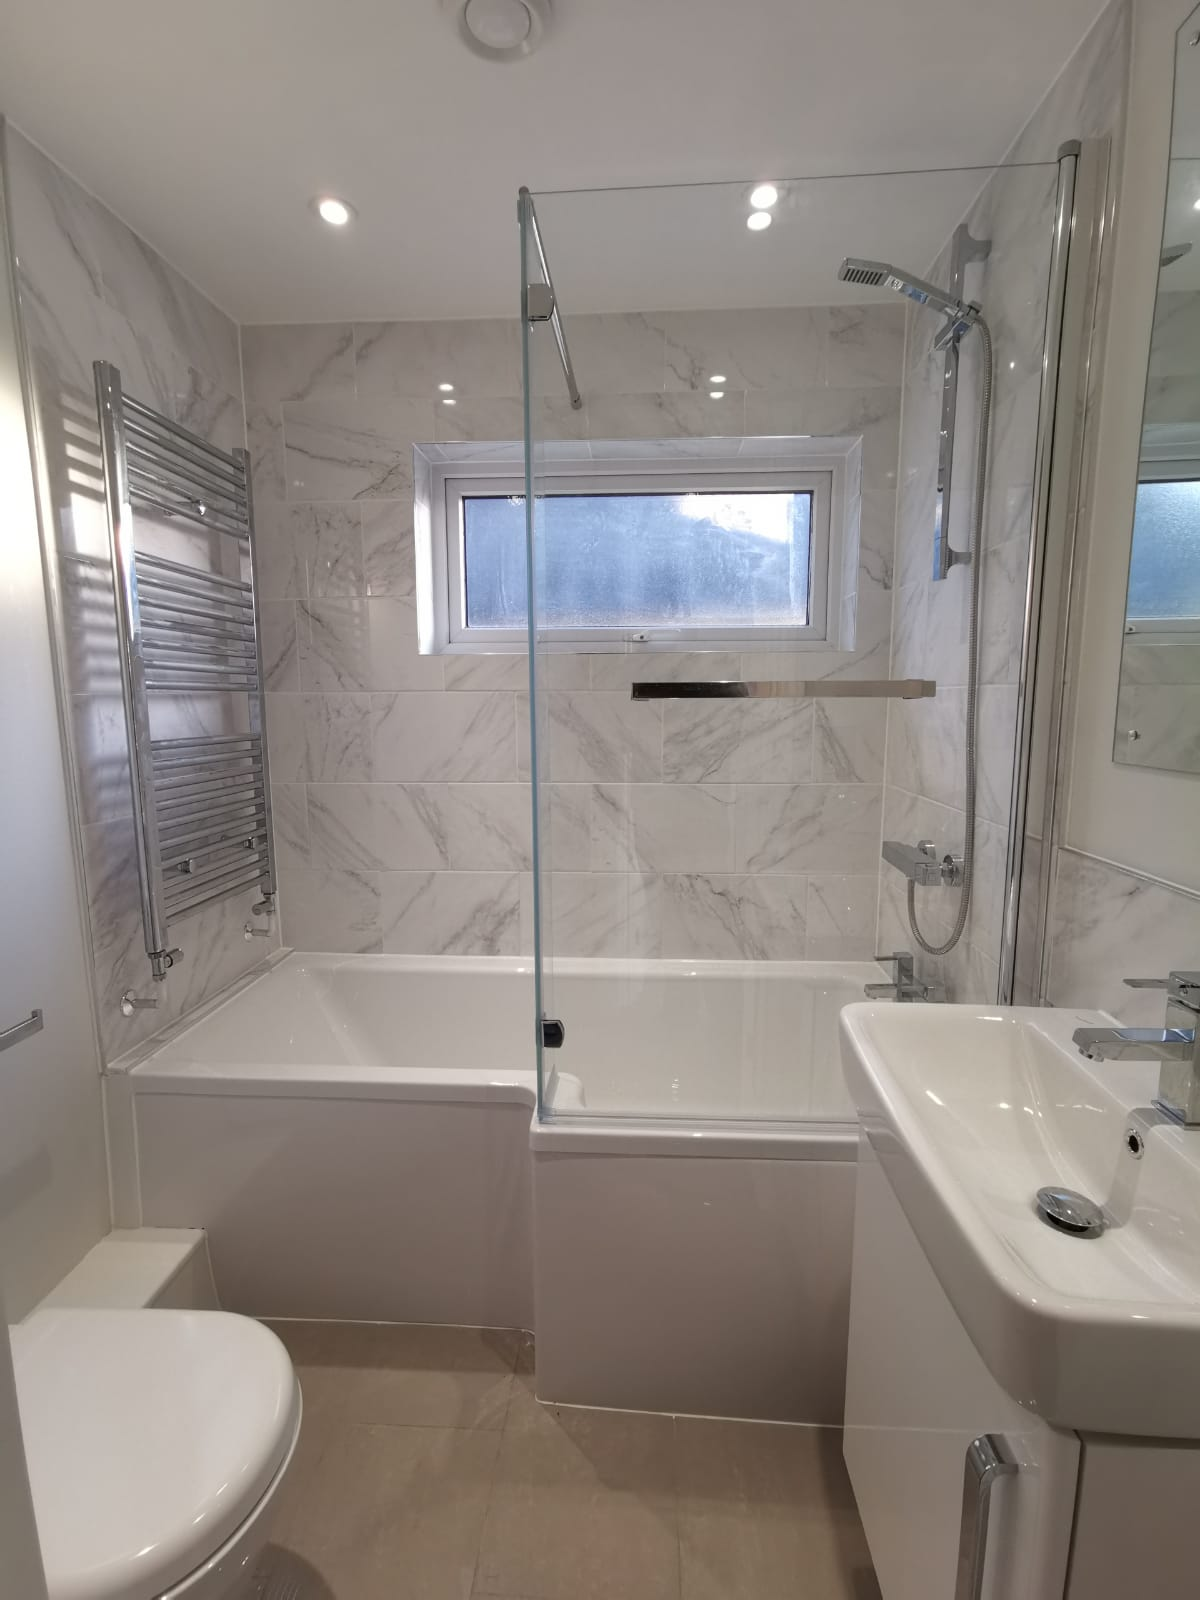 Holden Pk Rd Bathroom